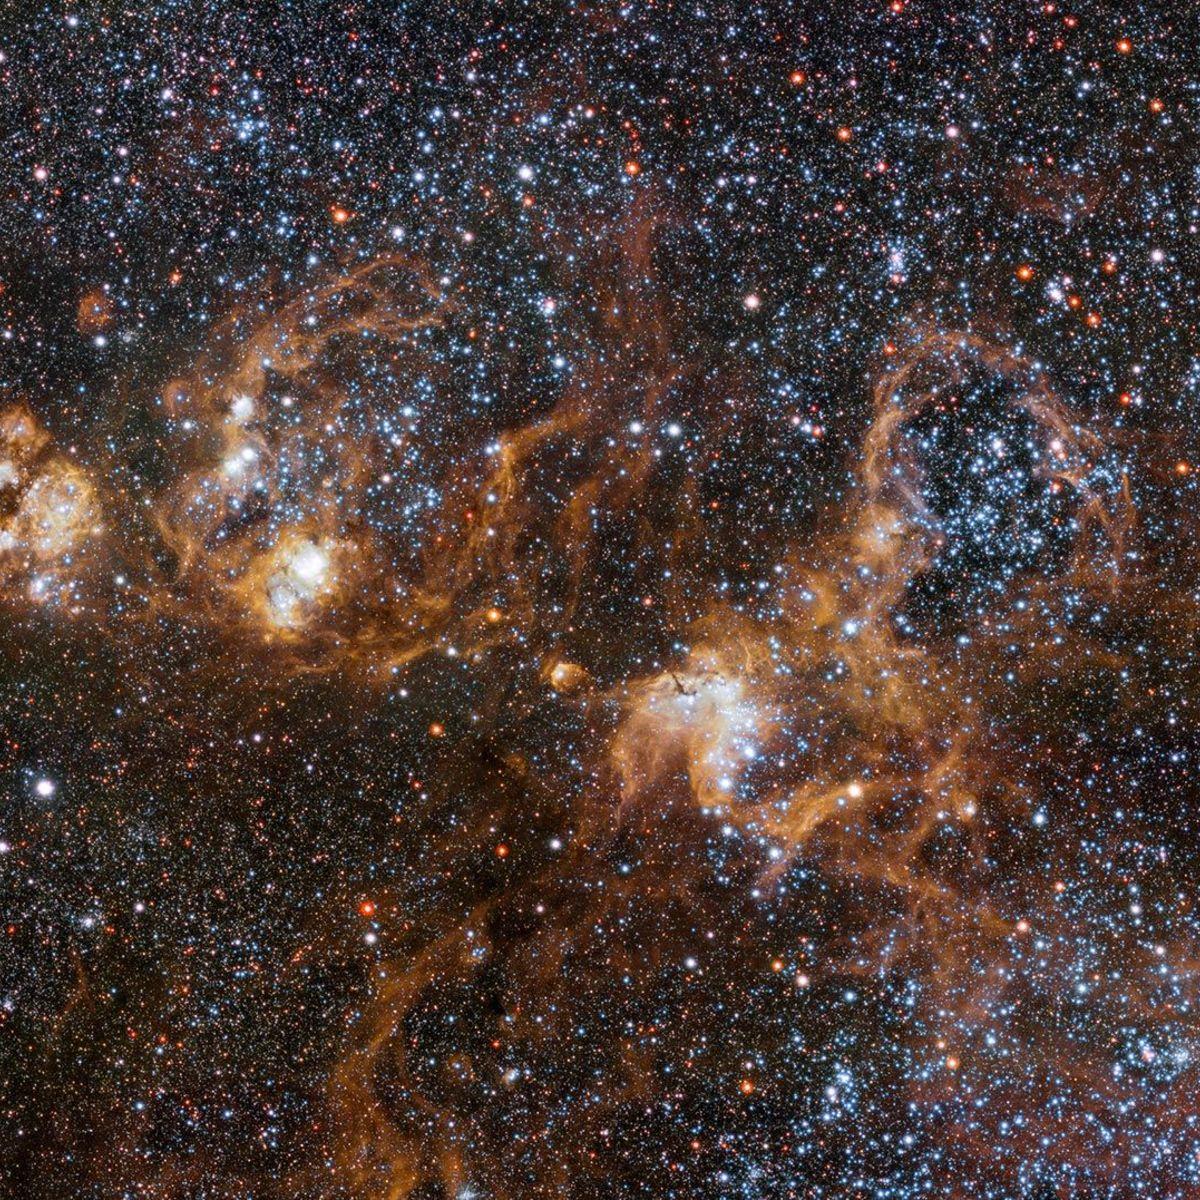 vlt_tarantula_heroThe hugely sprawling Tarantula Nebula, a vast star-forming complex in a nearby satellite galaxy of the Milky Way. Credit: ESO